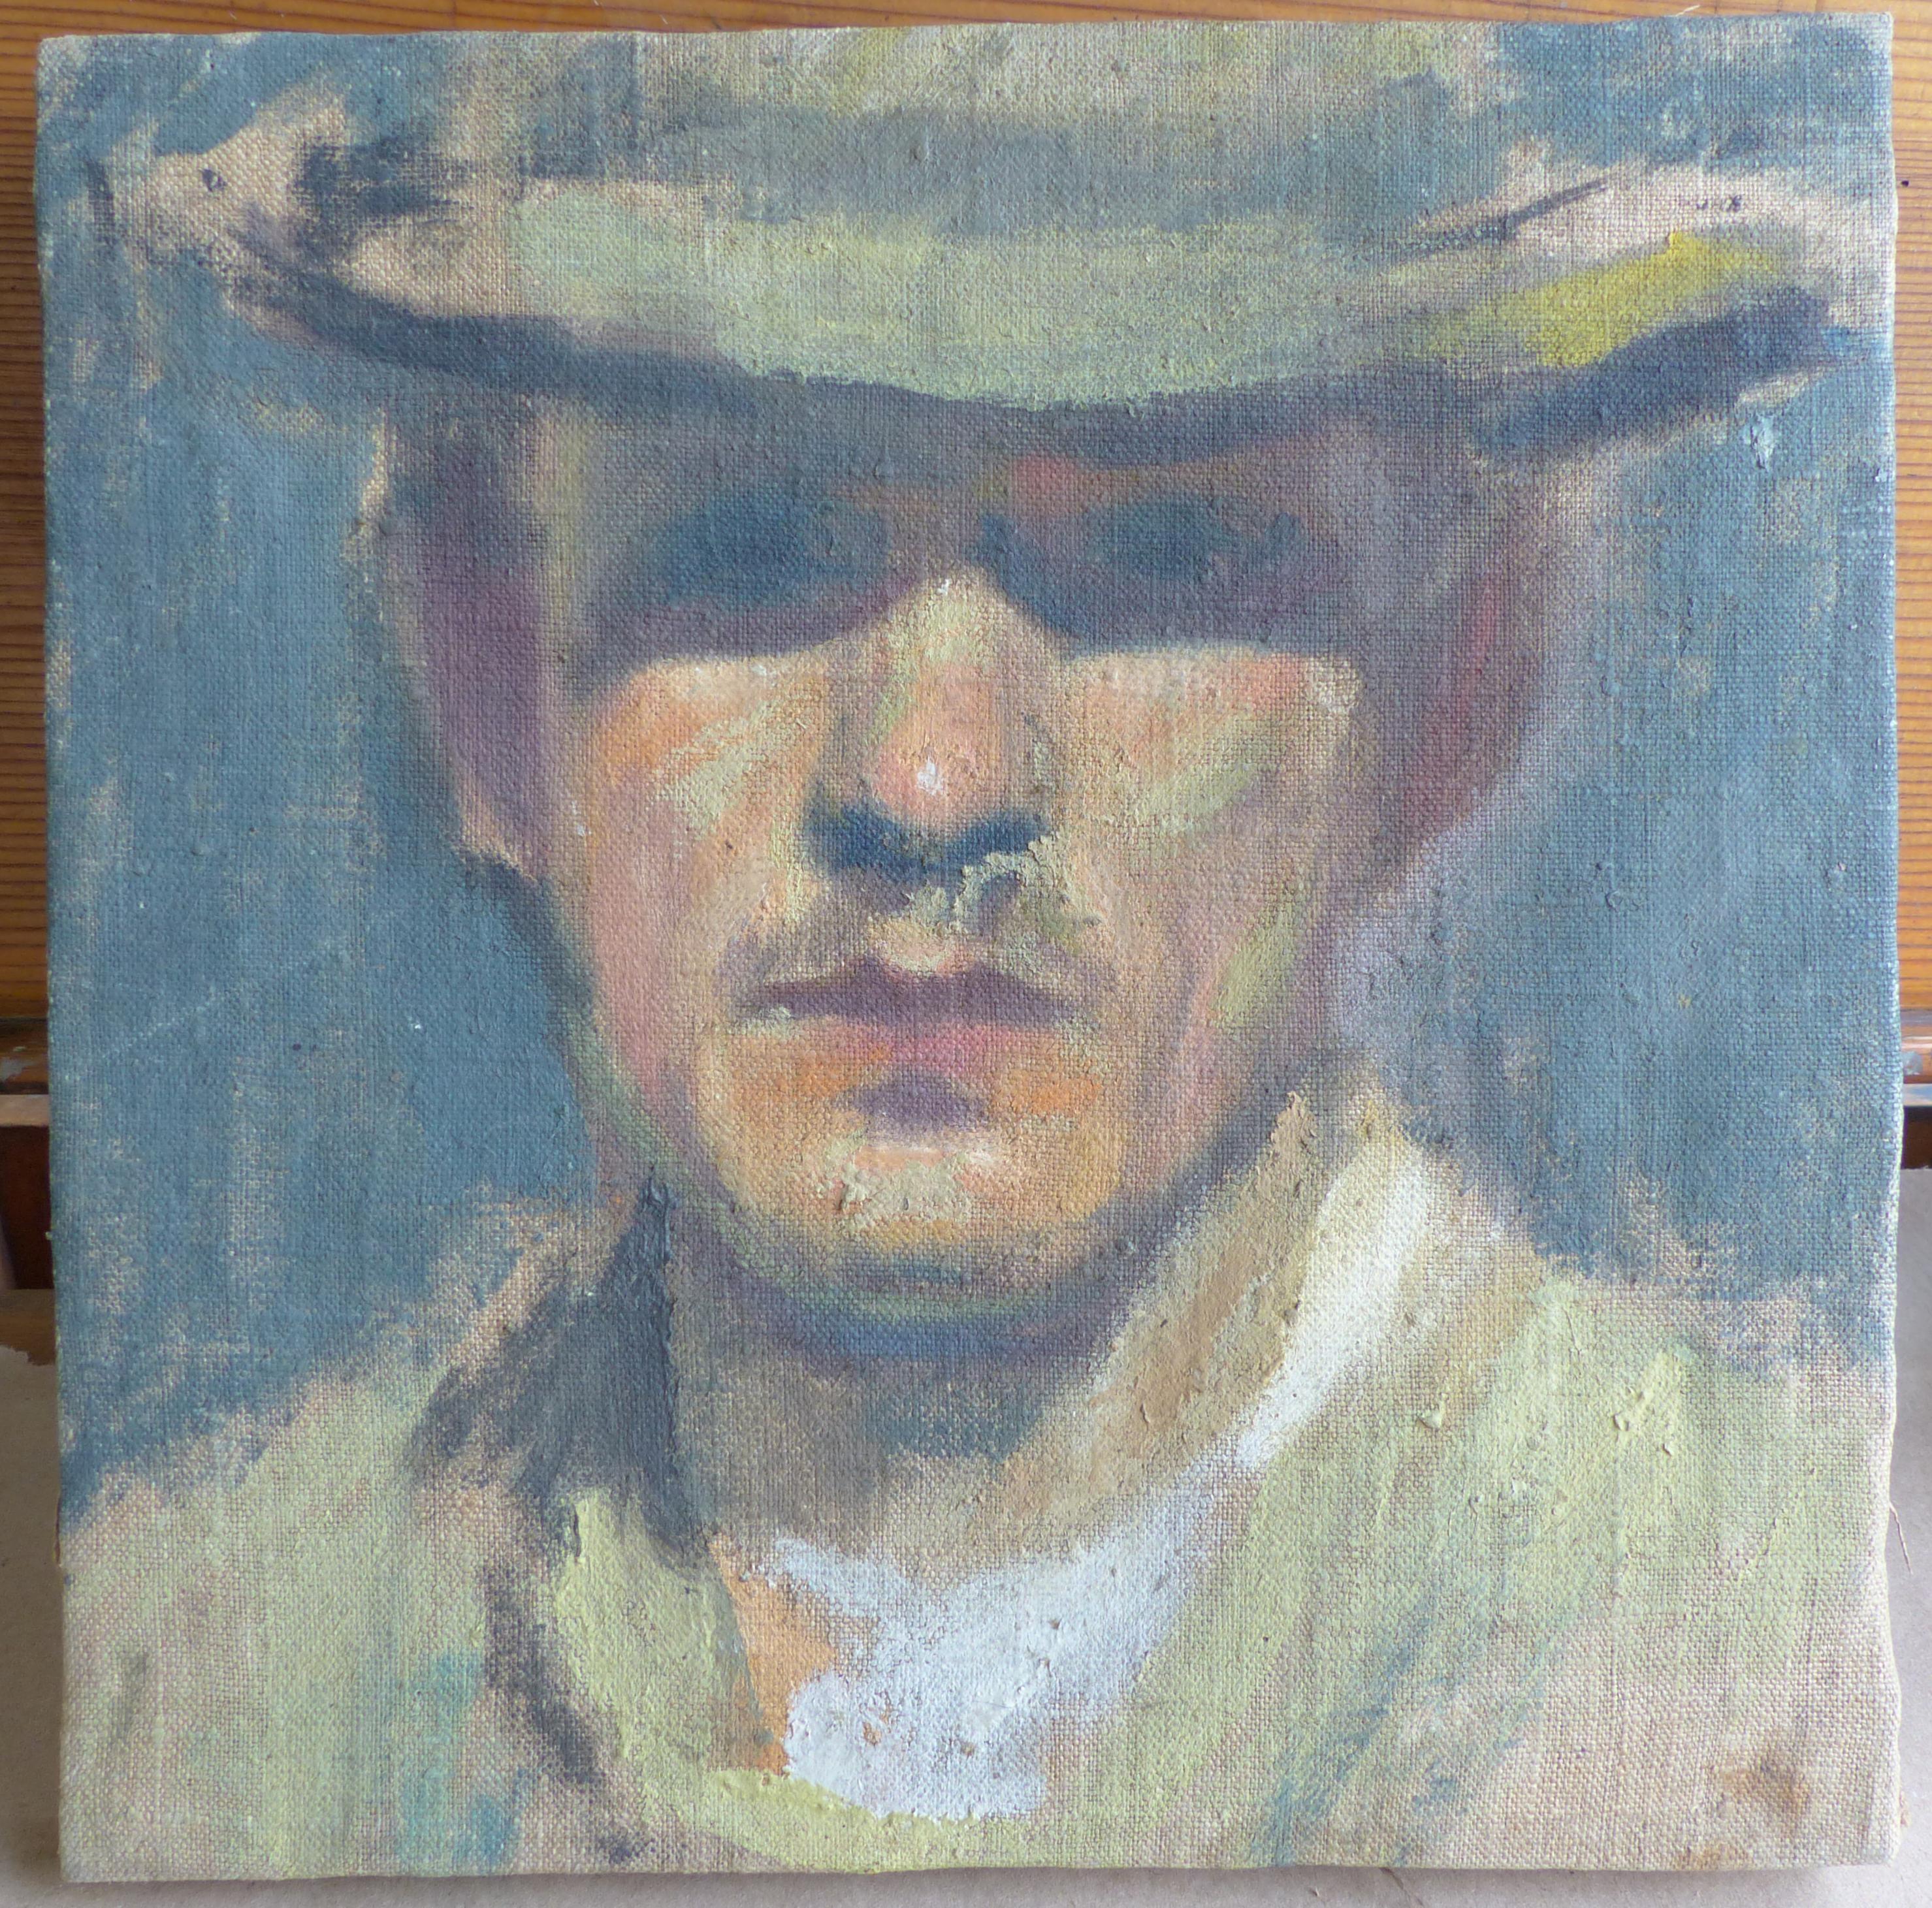 Joachim Selfportrait (before)